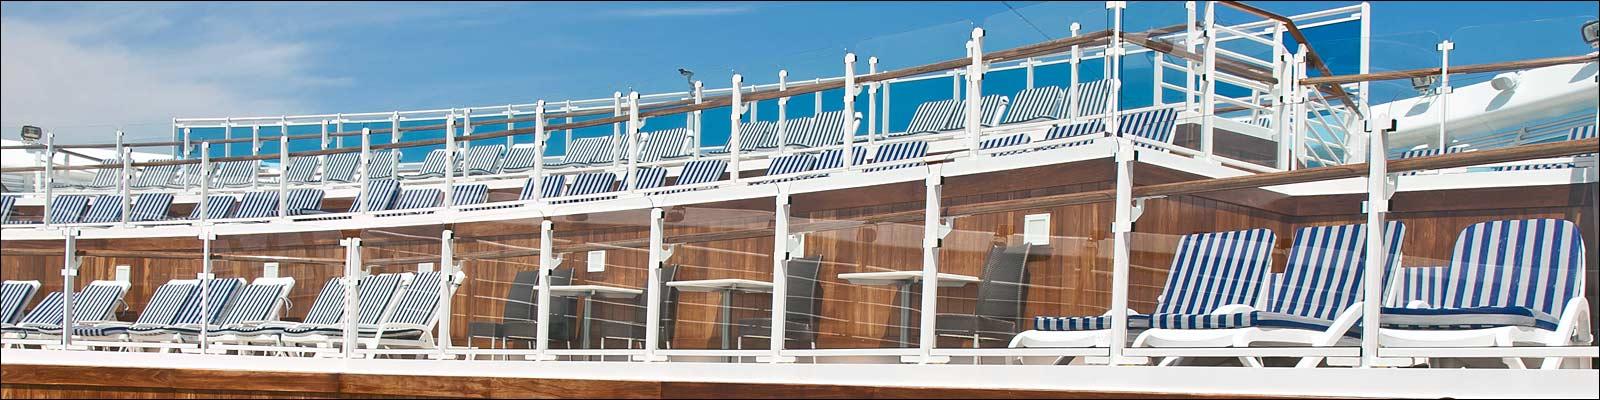 Cruise-SS02